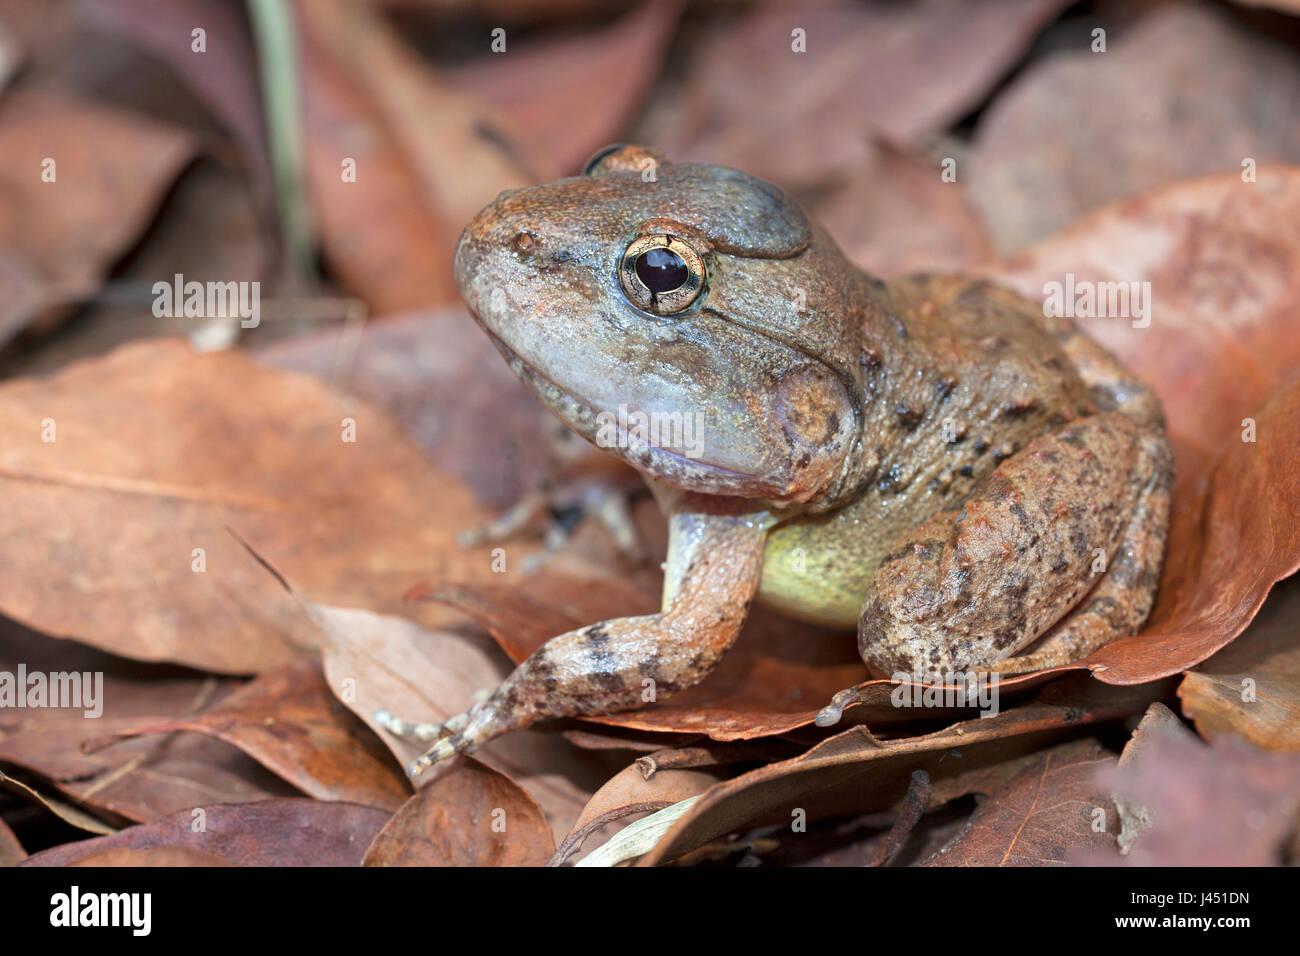 Gyldenstolpe's frog on forest floor - Stock Image